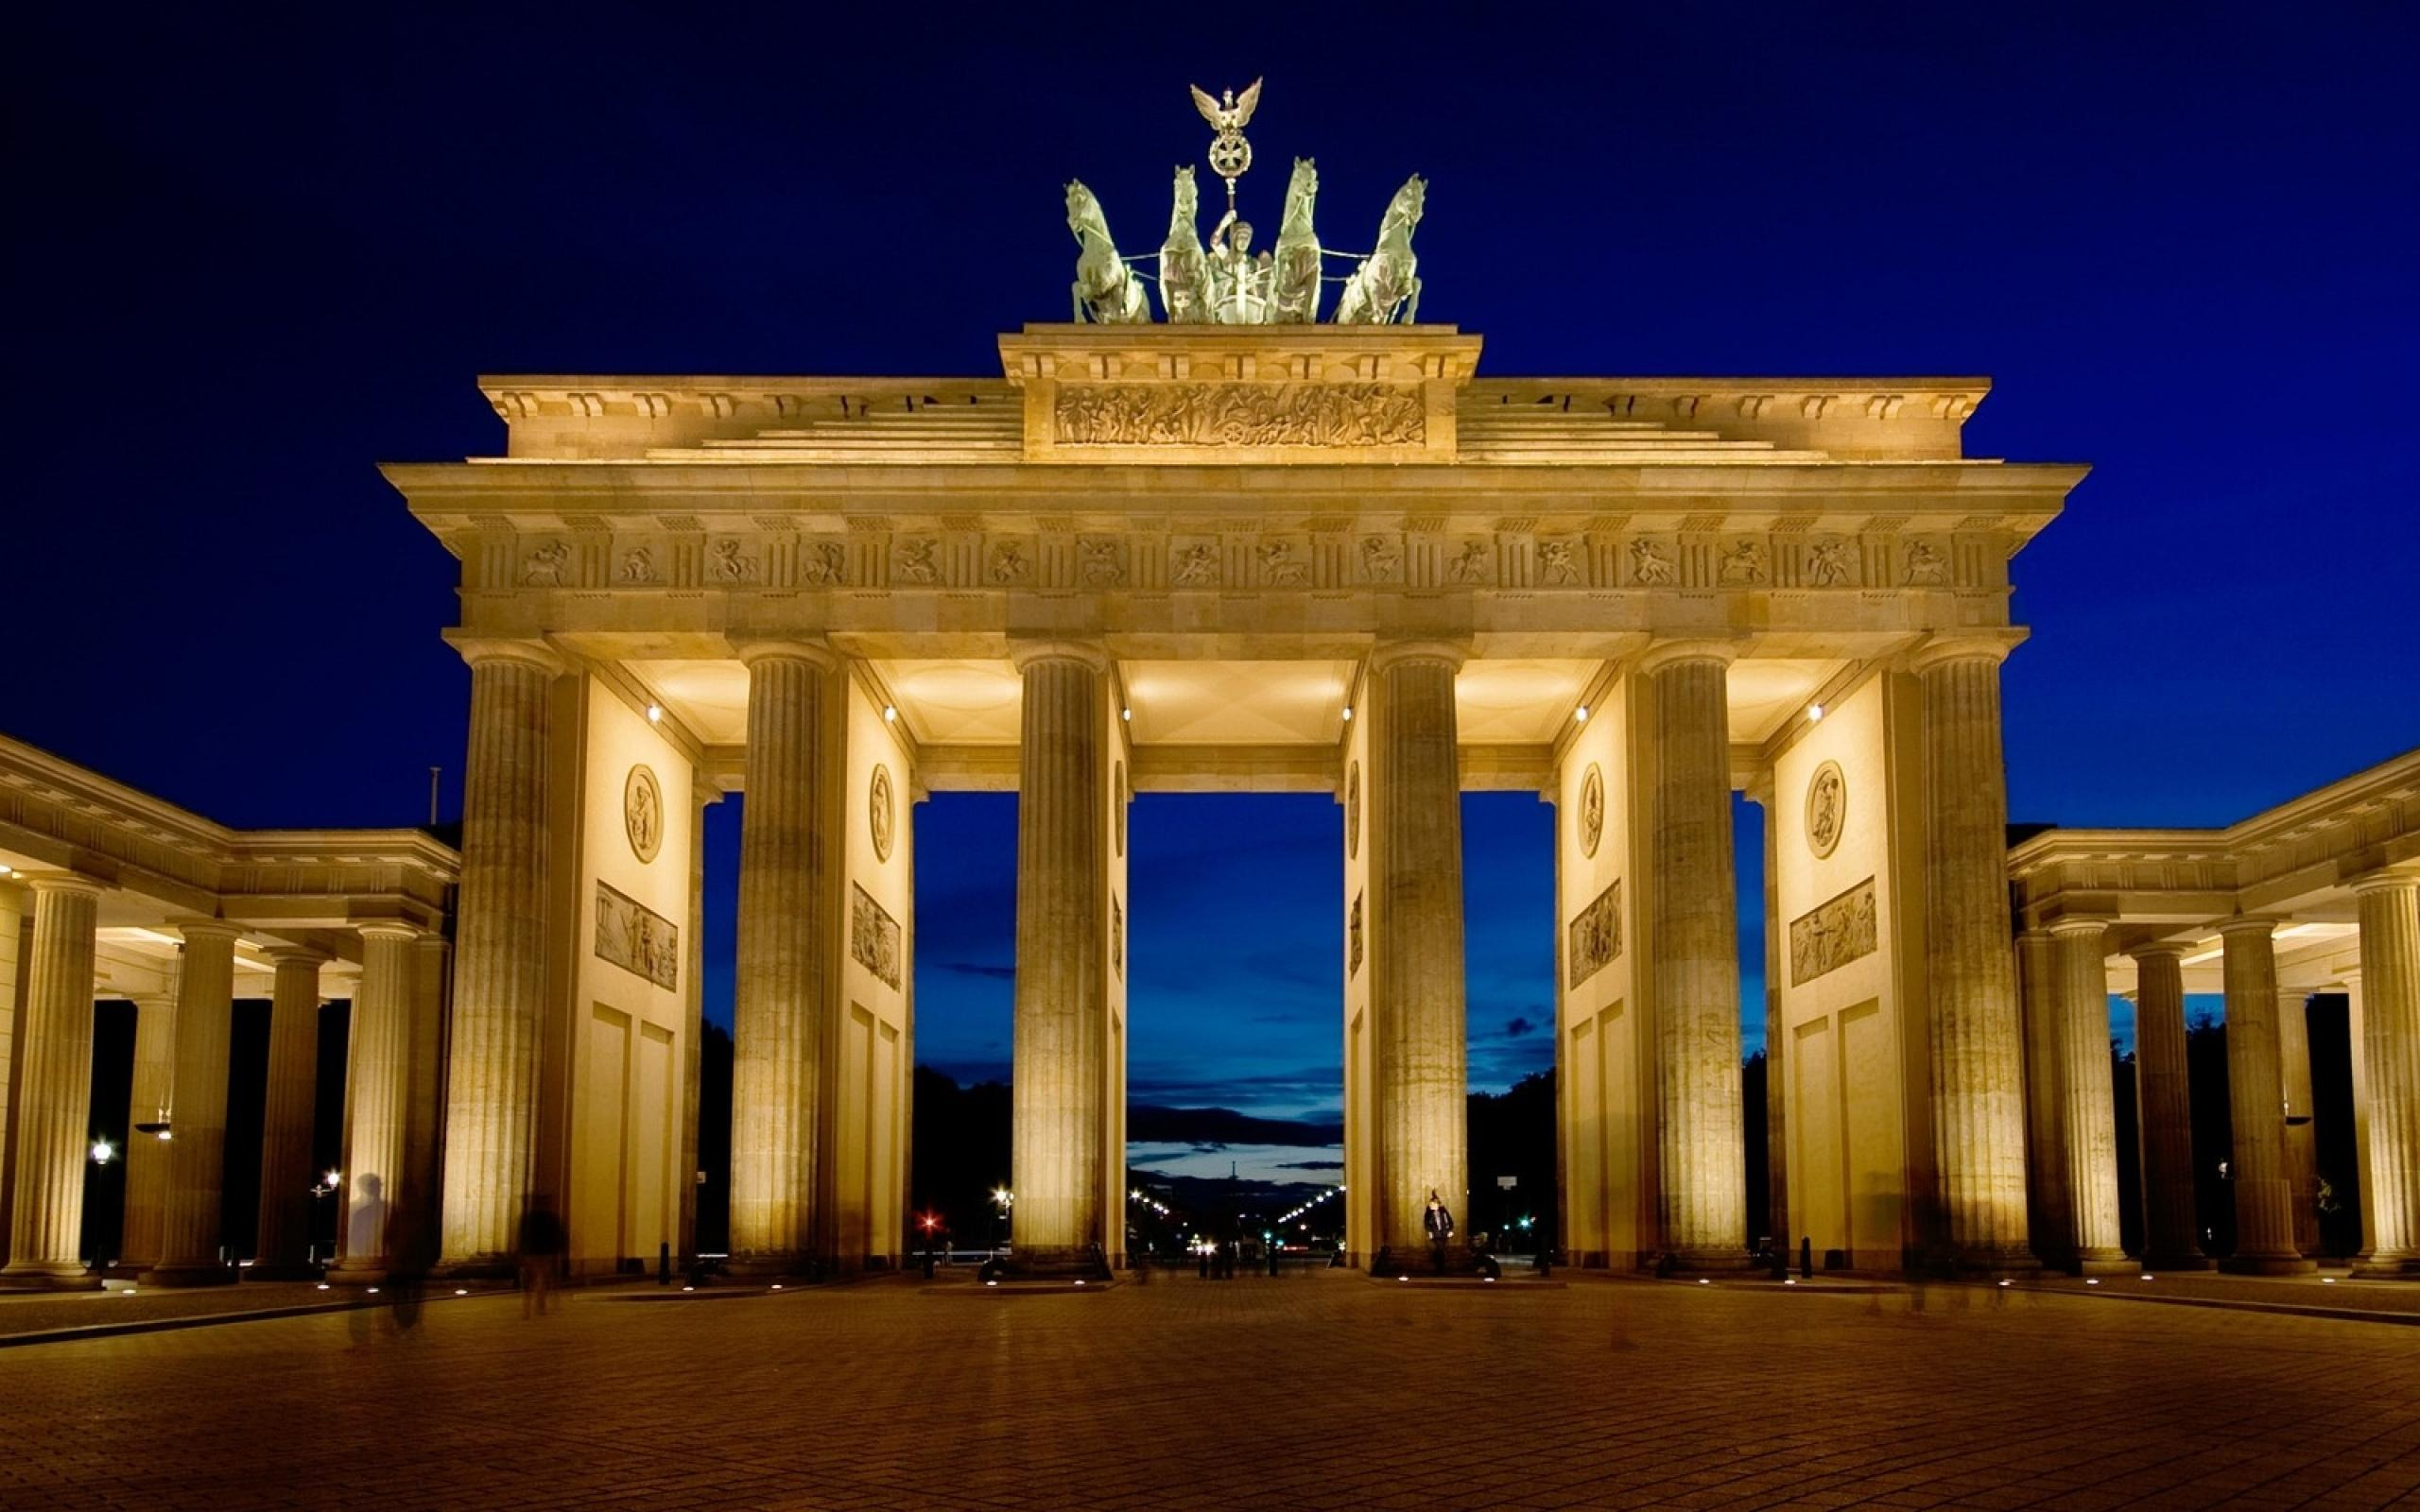 Brandenburg-Gate-Berlin-Germany-Wallpaper ...